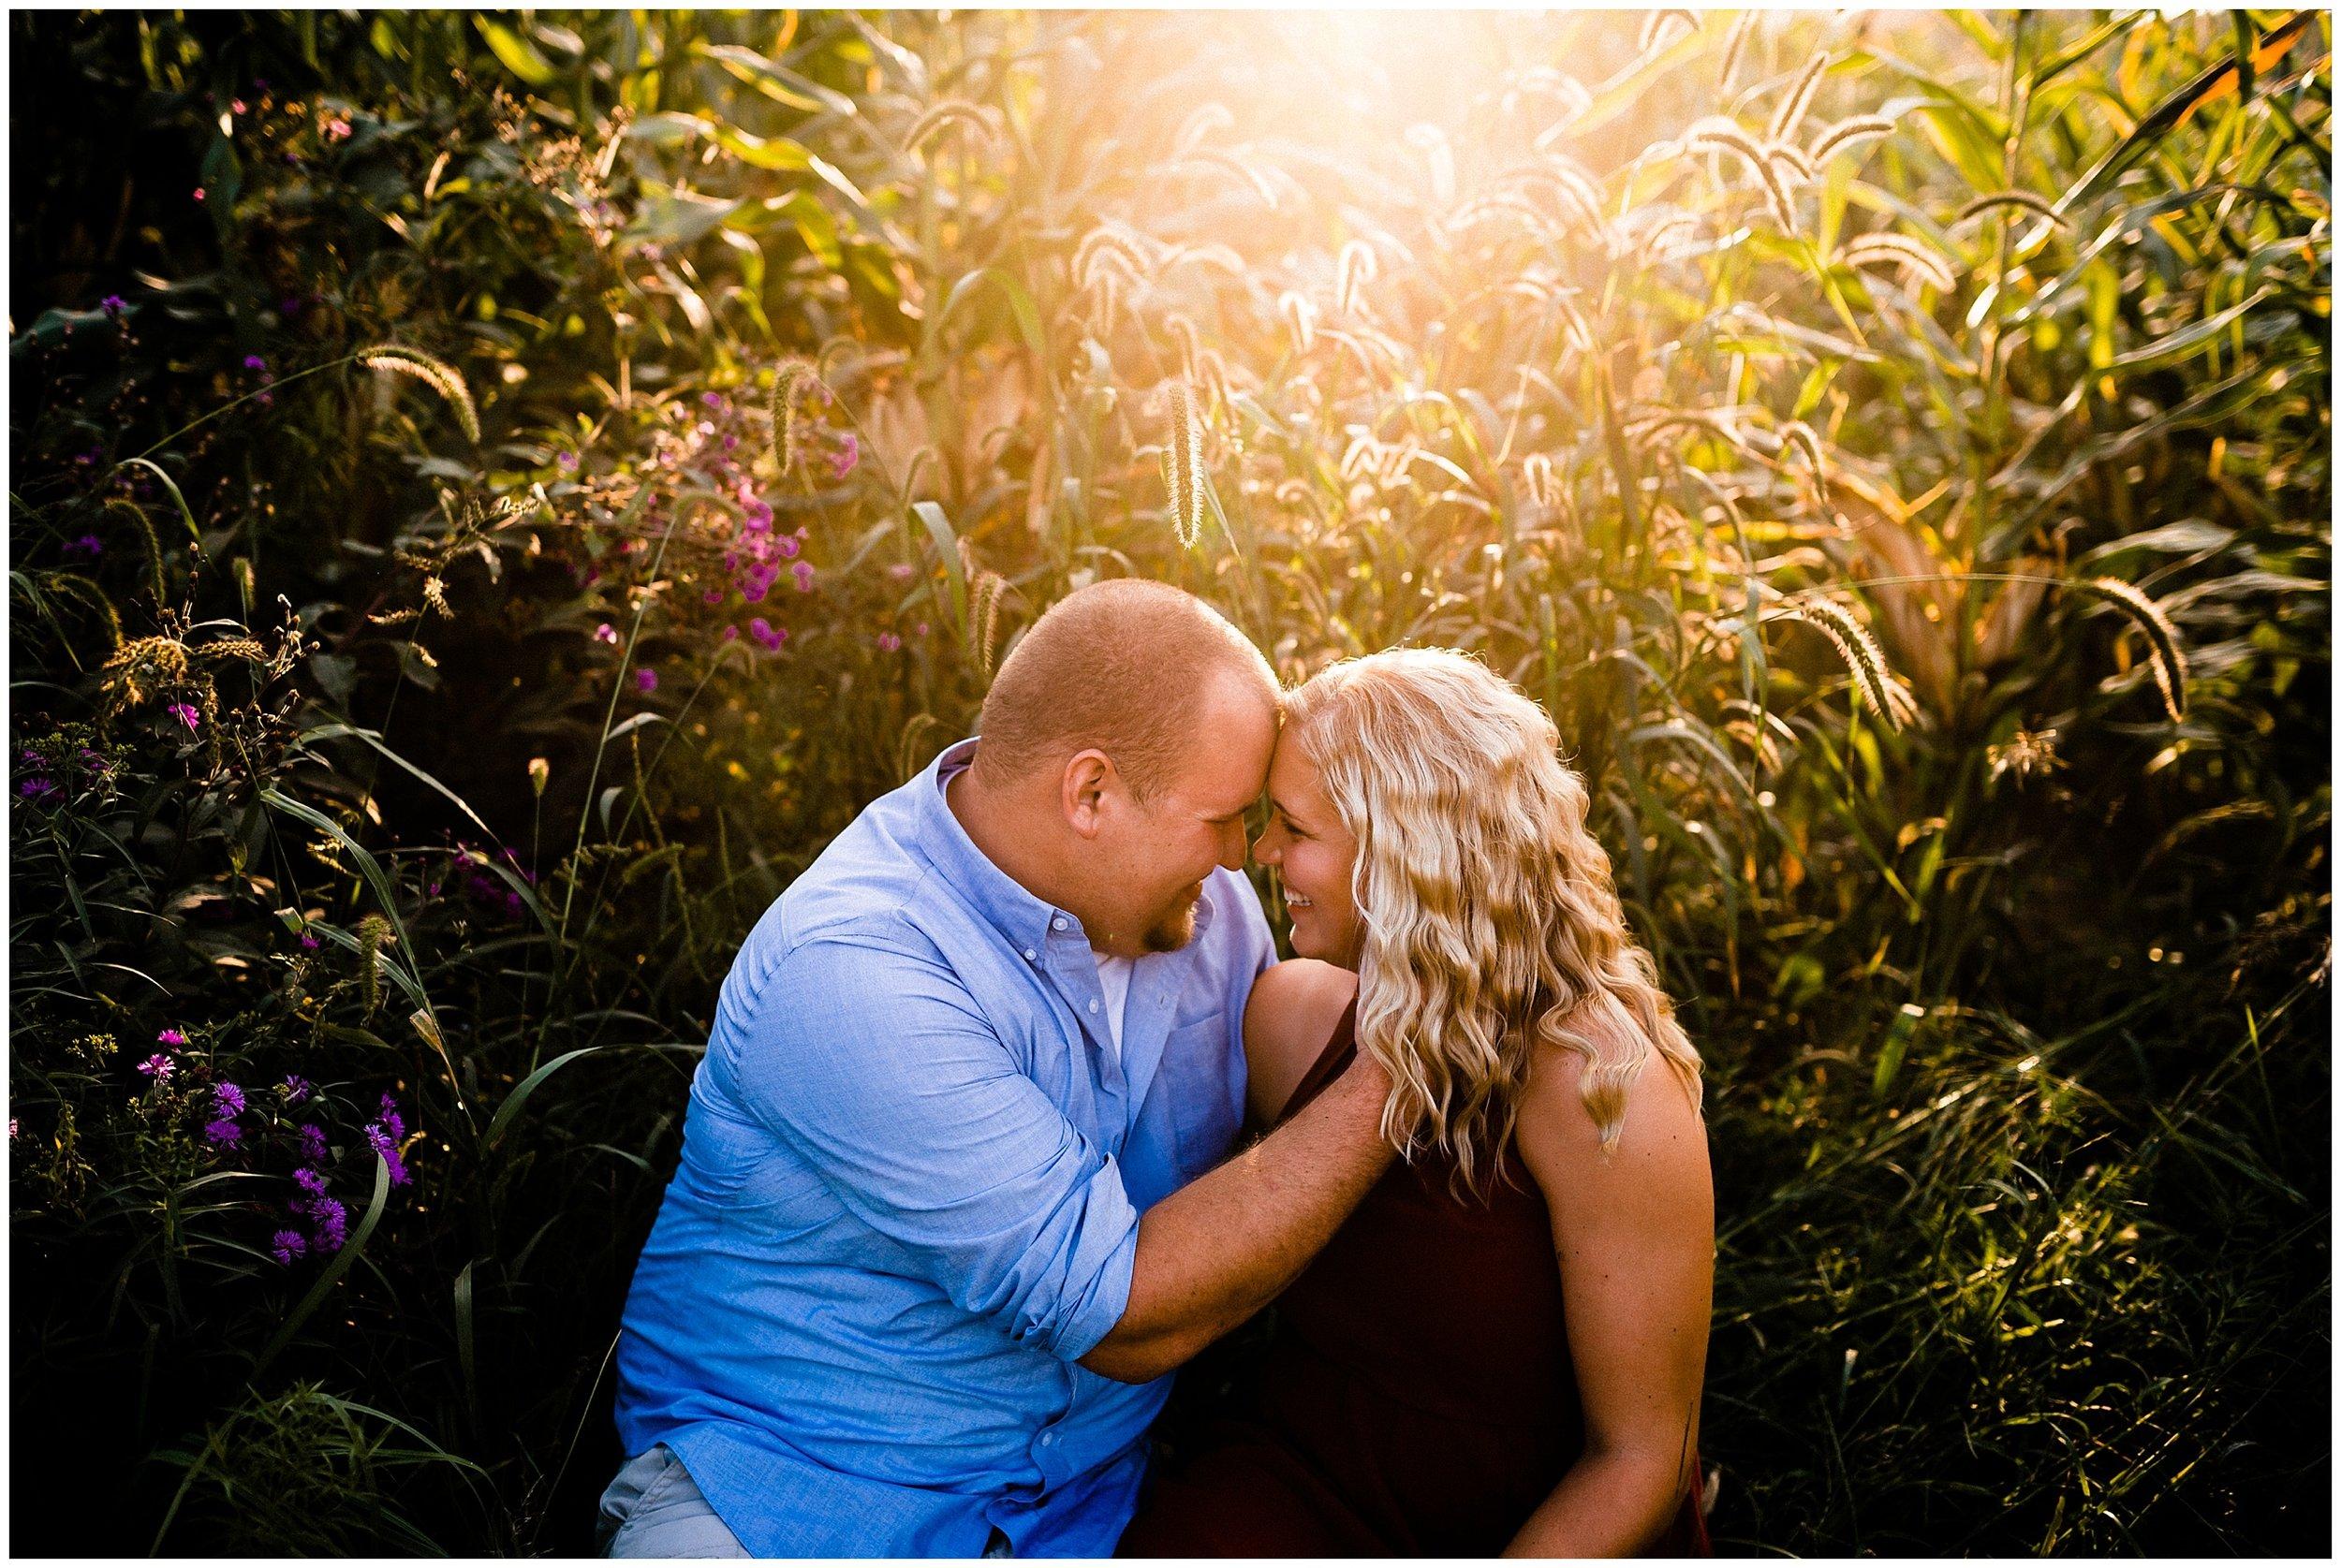 Nate + Tamryn | Engaged #kyleepaigephotography_1031.jpg